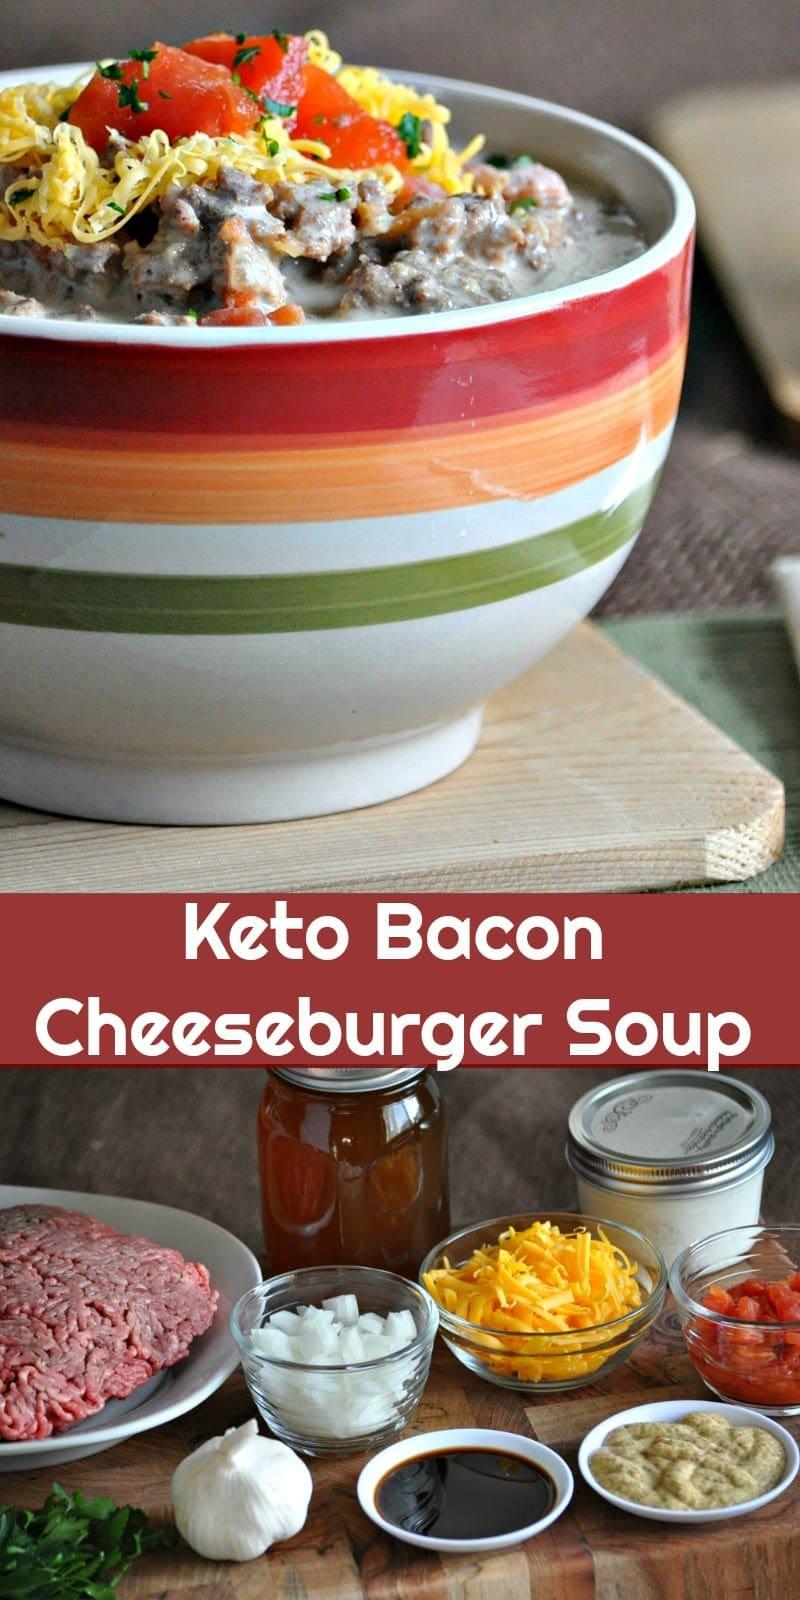 Keto Bacon Cheeseburger Soup | Peace Love and Low Carb #keto #ketogenic #lowcarb #soup #bacon #cheeseburger